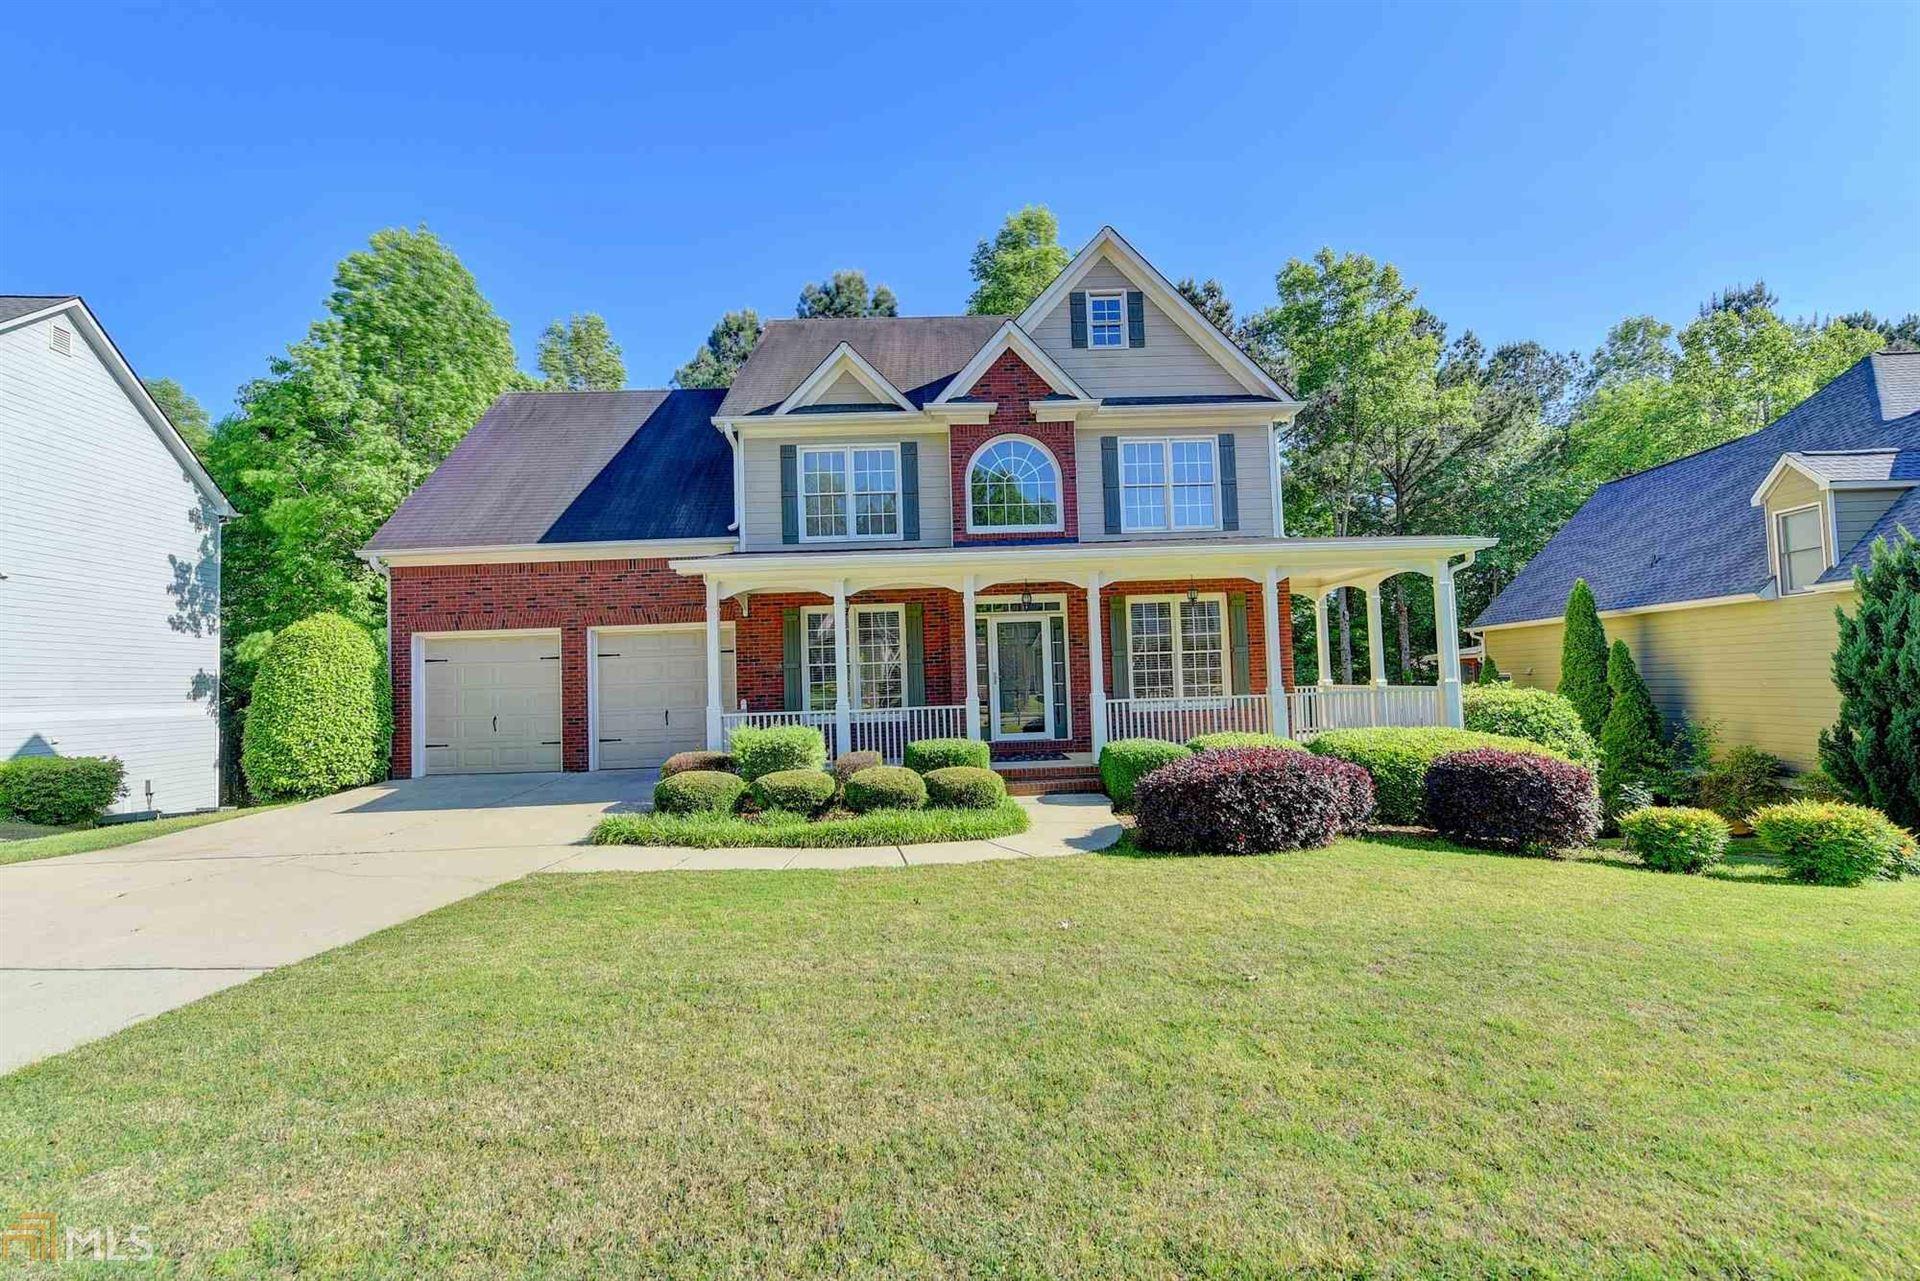 181 Vine Creek Dr, Acworth, GA 30101 - MLS#: 8775412